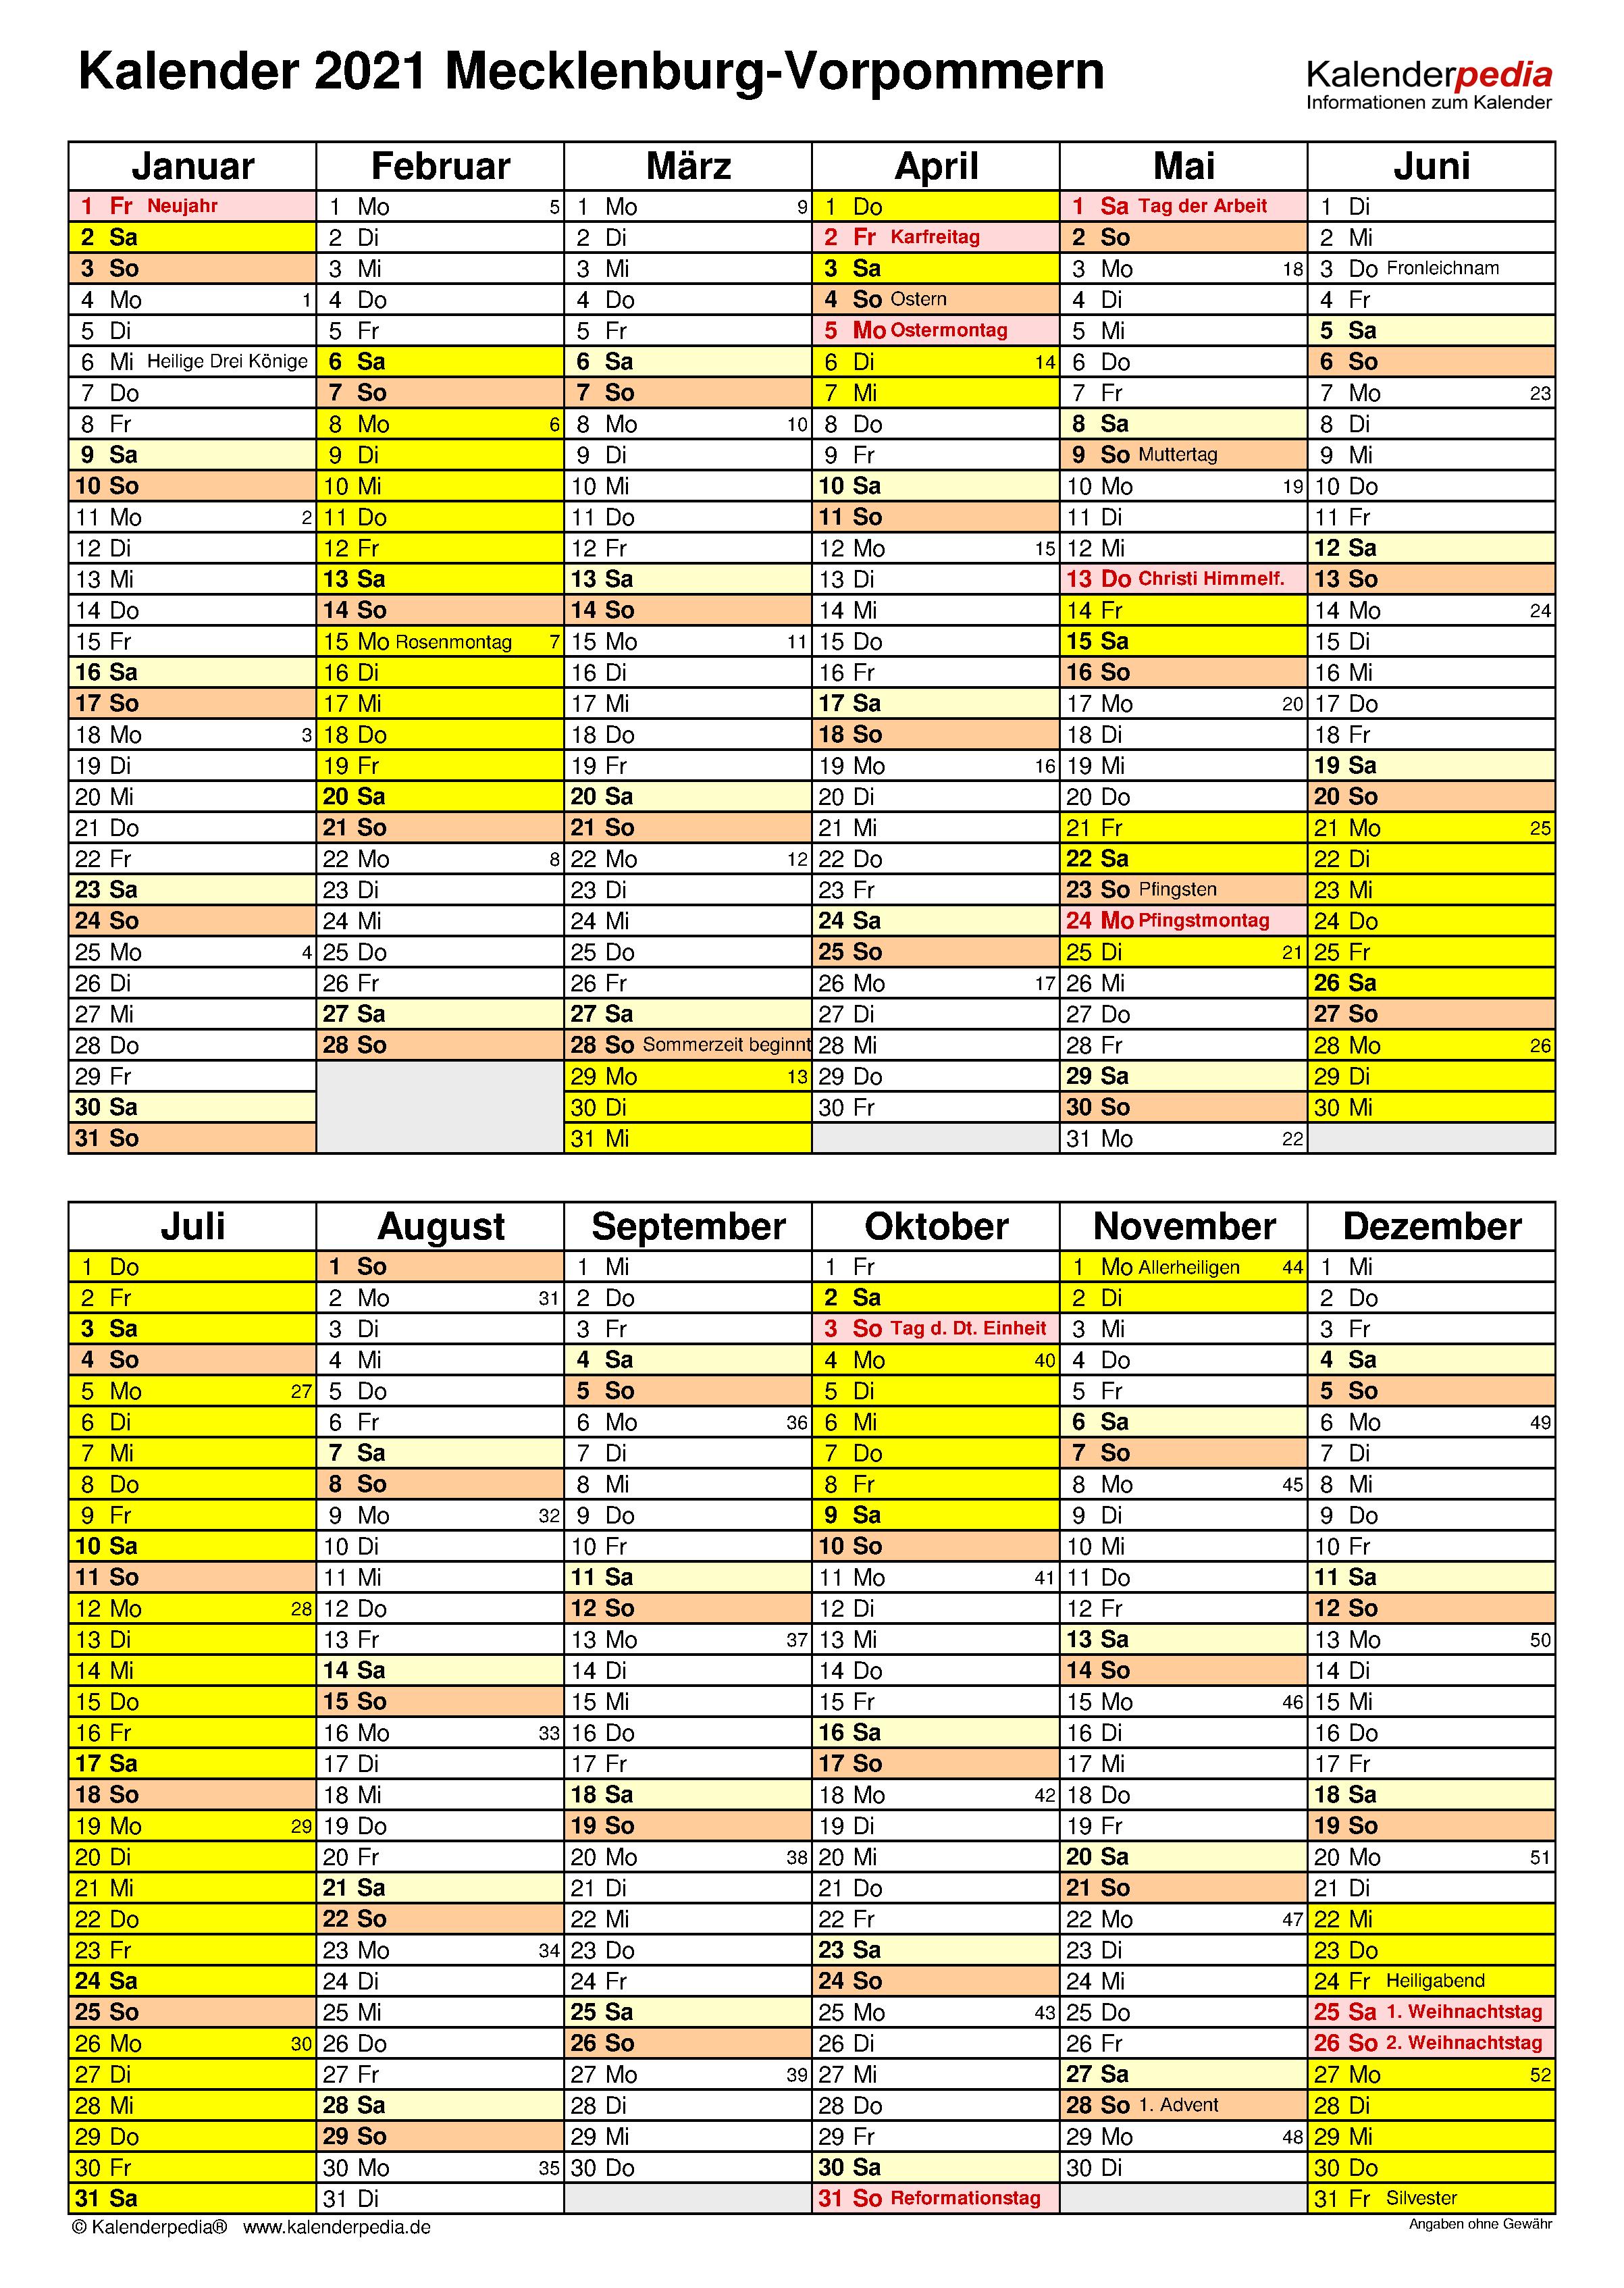 Kalender 2021 Mv